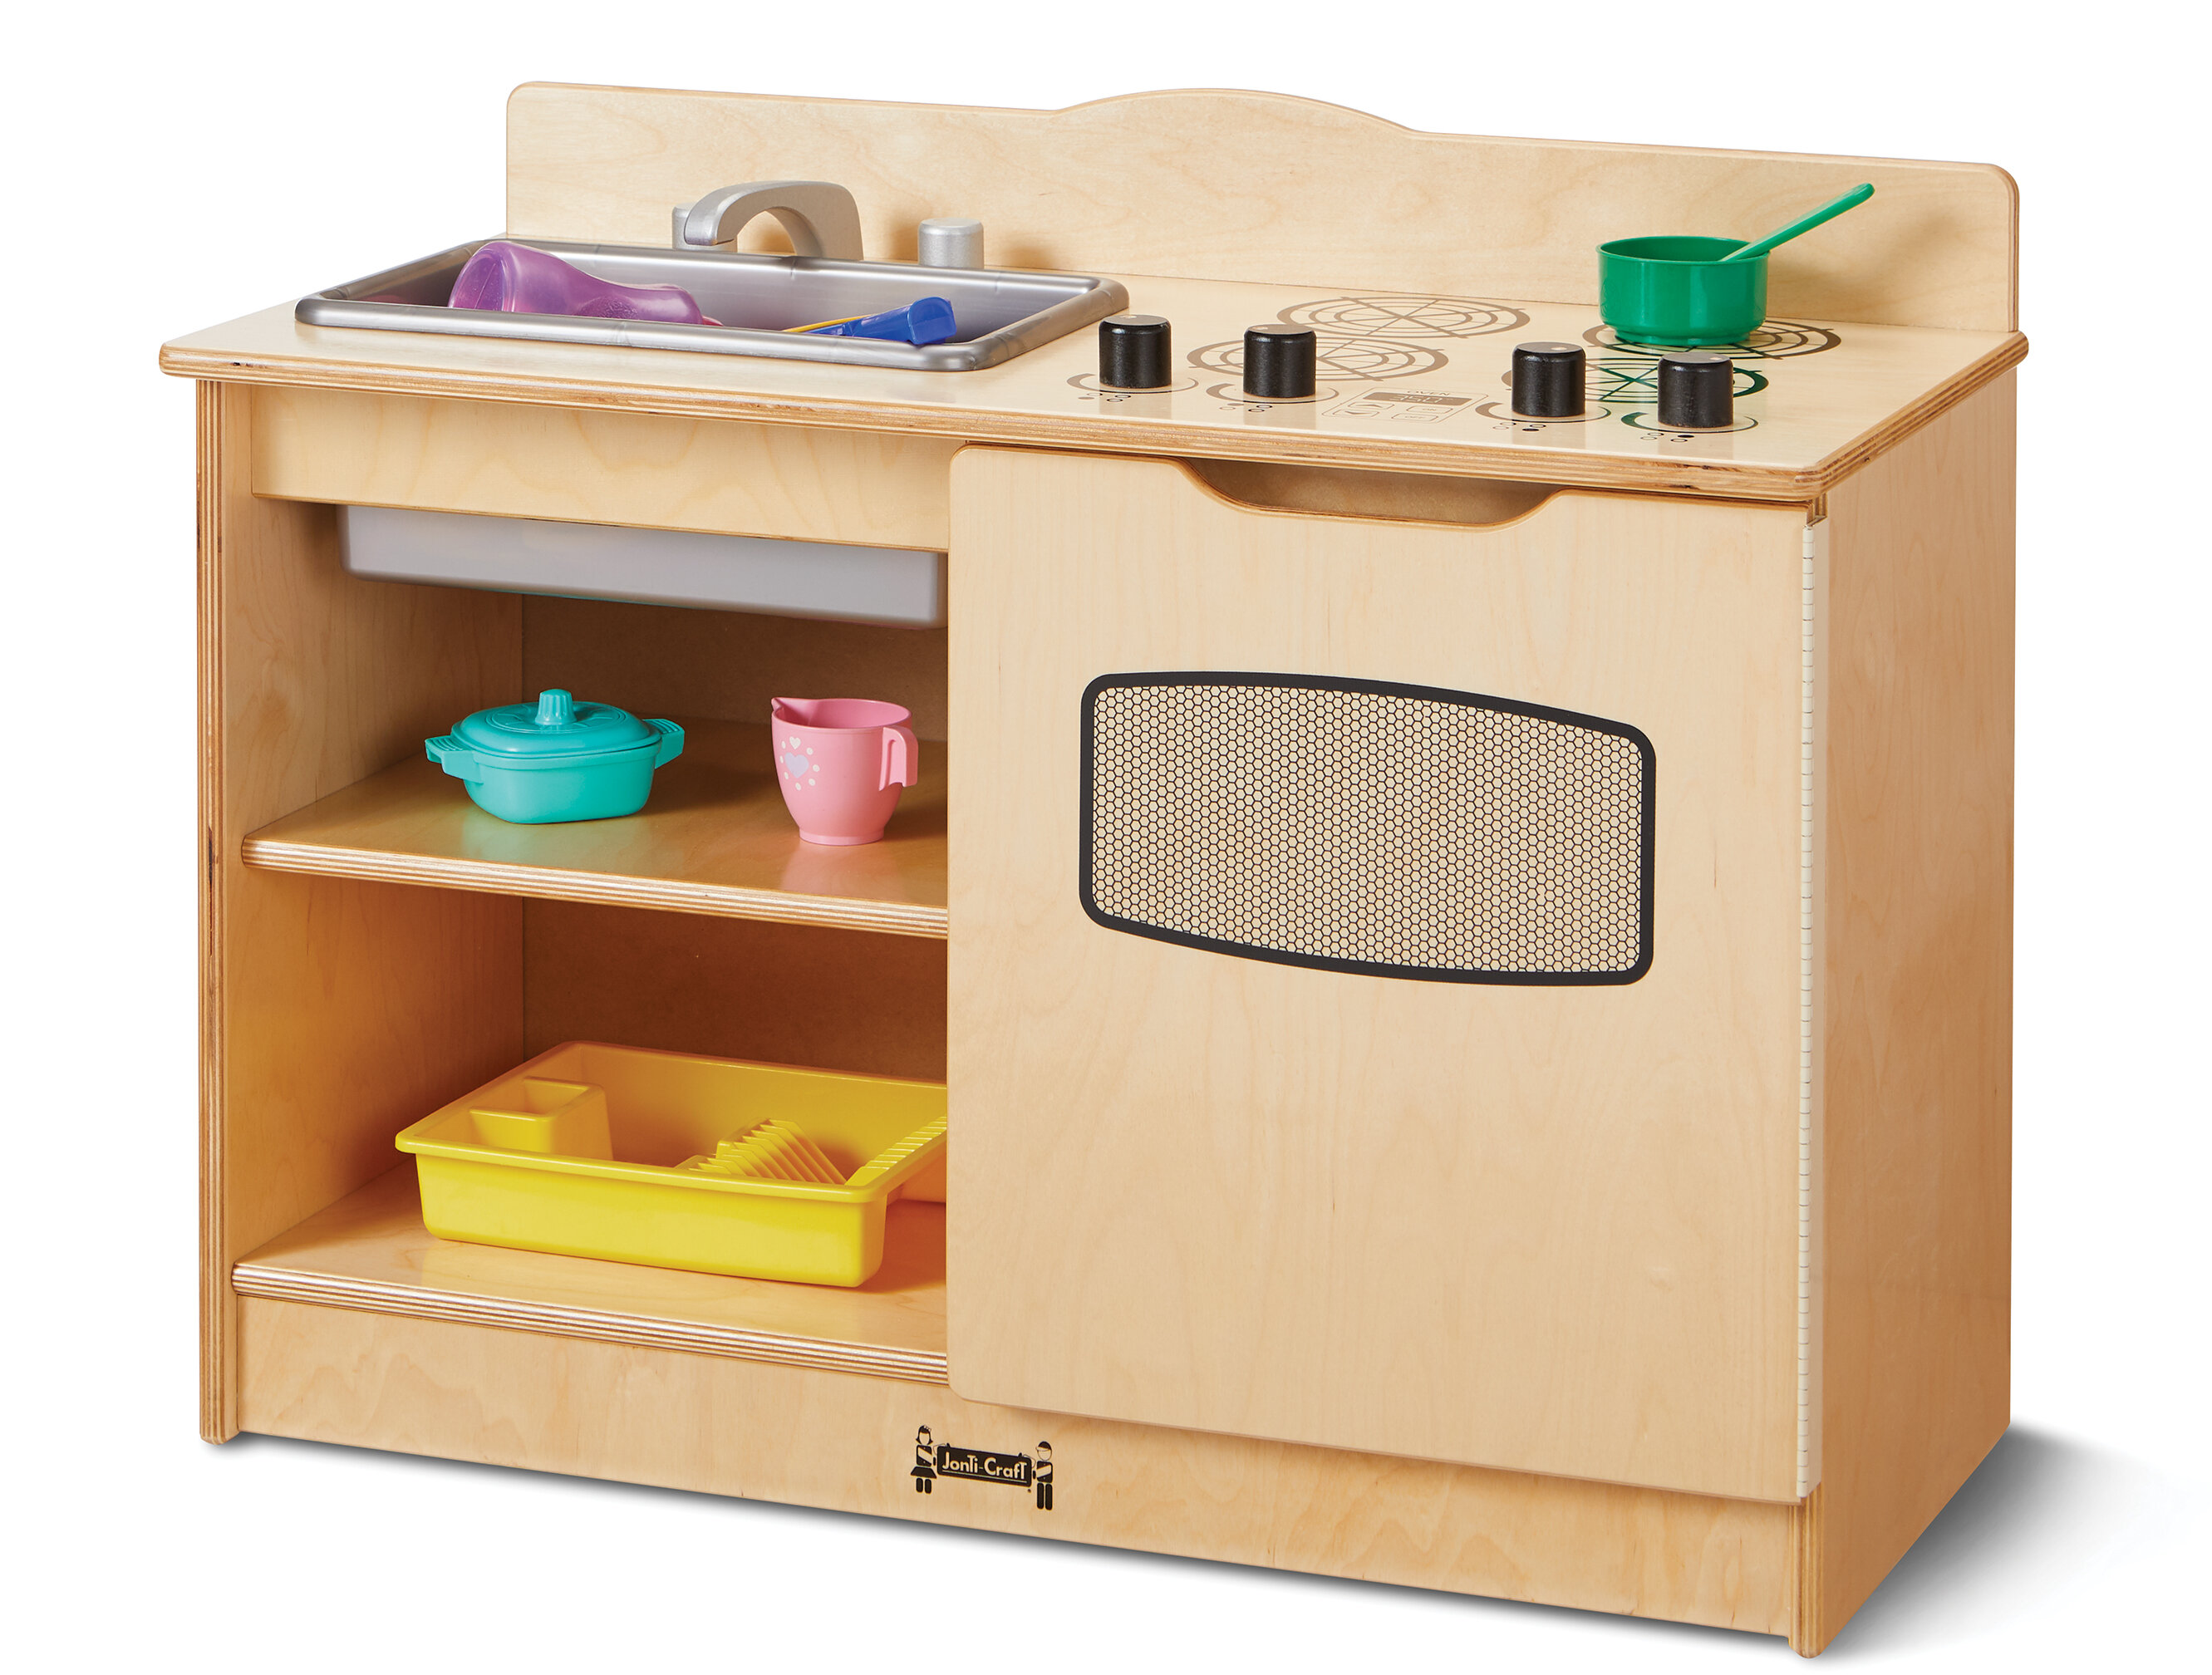 Jonti Craft Toddler Café Kitchen Set